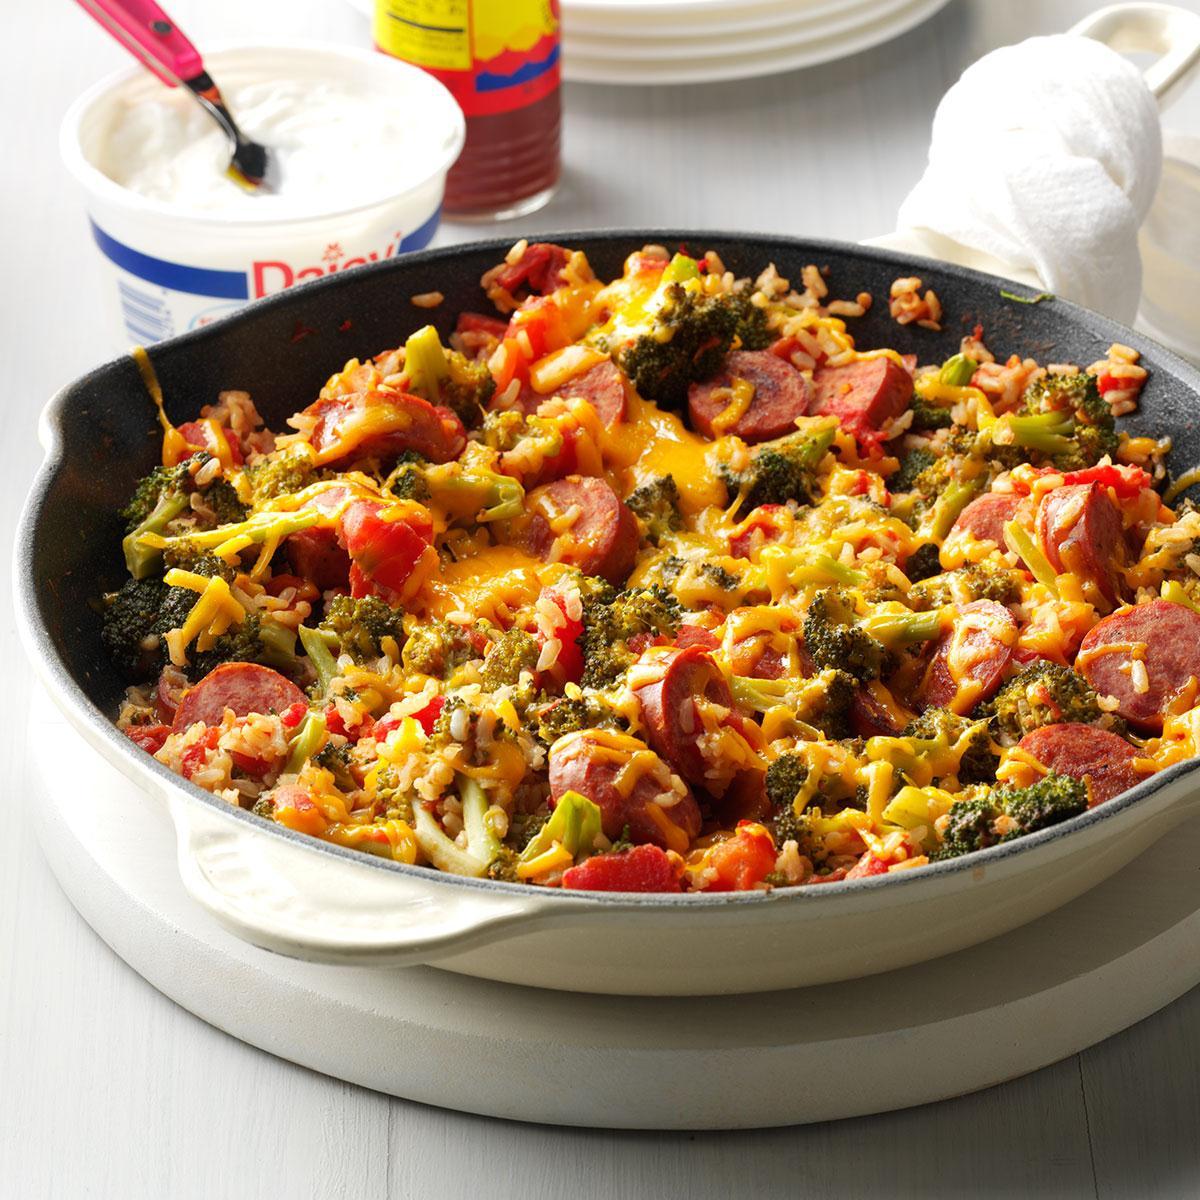 Broccoli Rice And Sausage Dinner Recipe